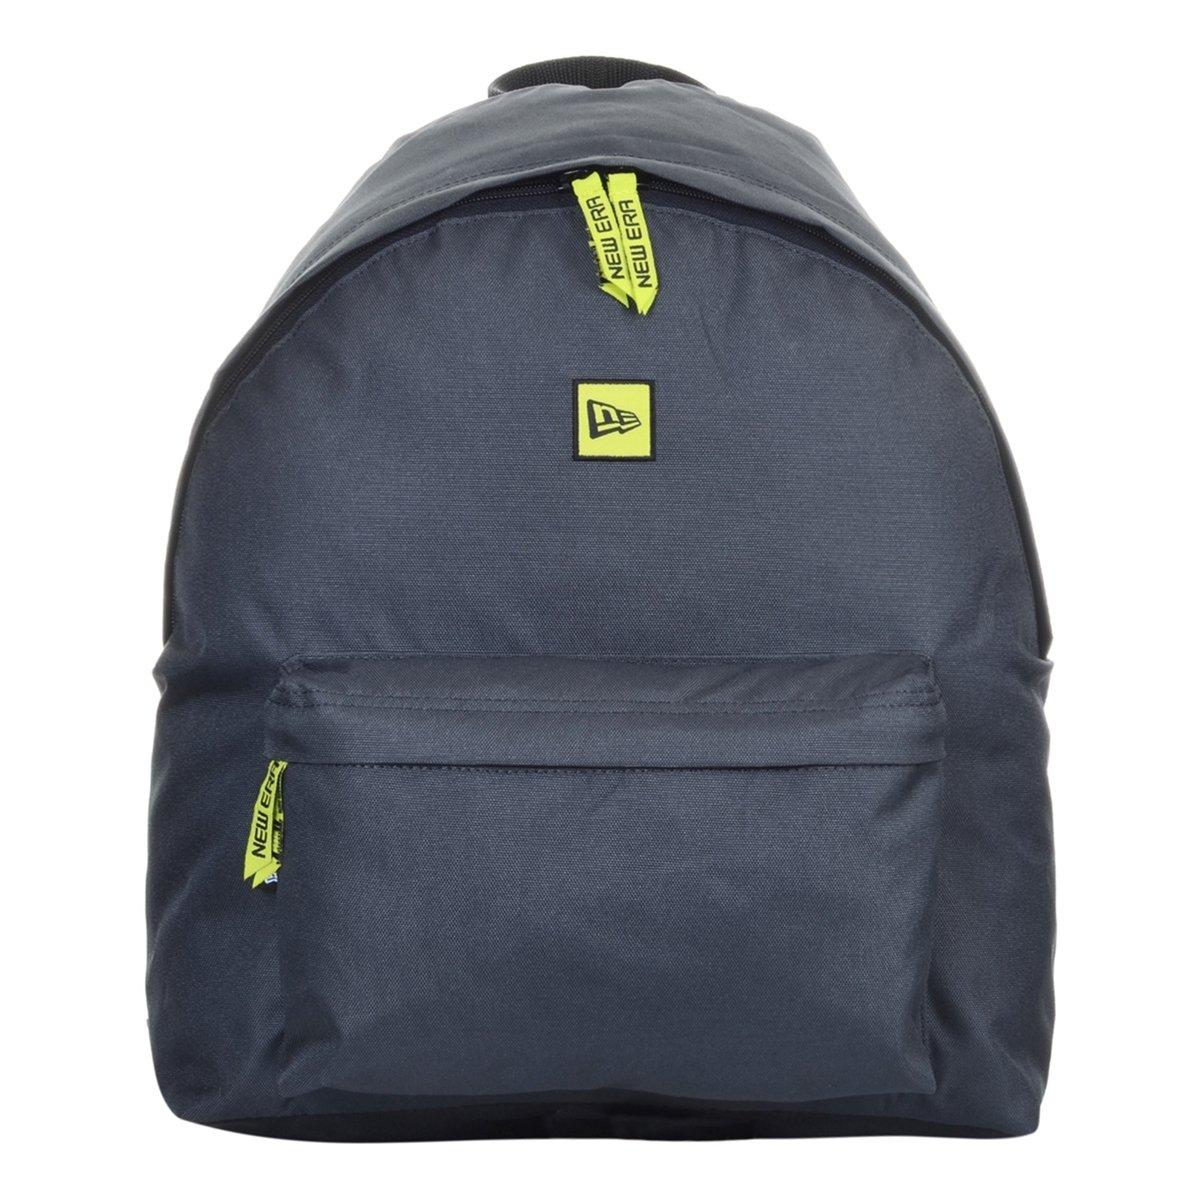 Mochila New Era Back Pack - Chumbo - Compre Agora  9d54d010948